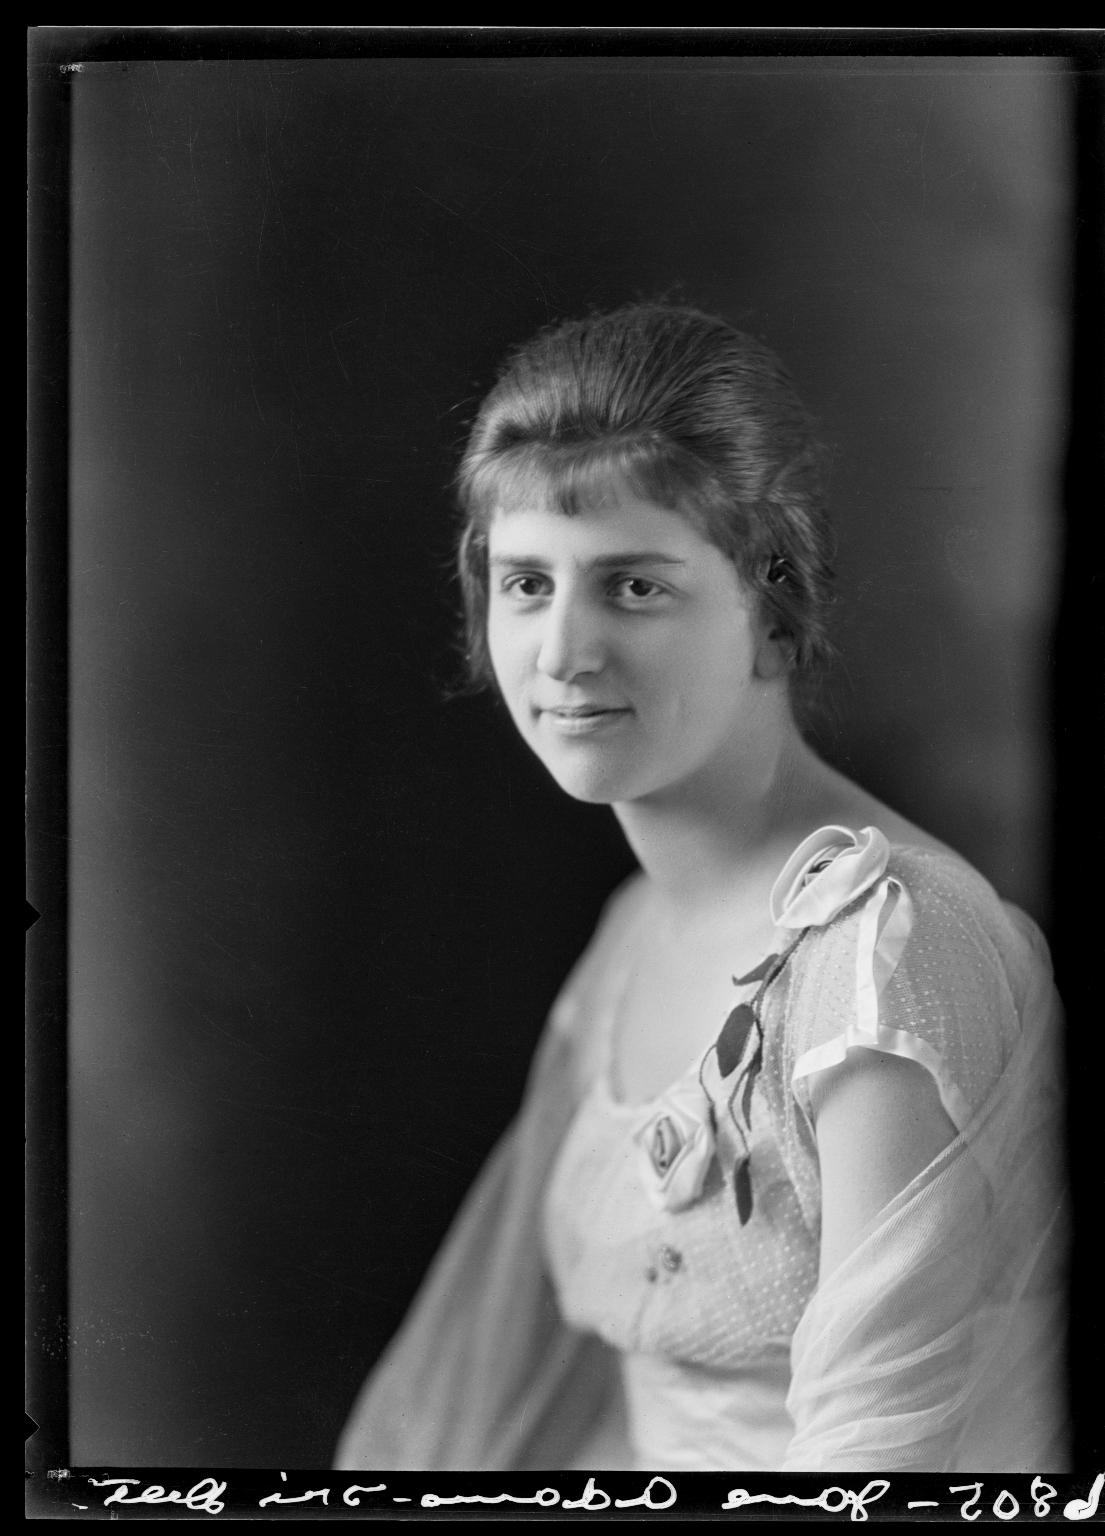 Portraits of Jane Adams